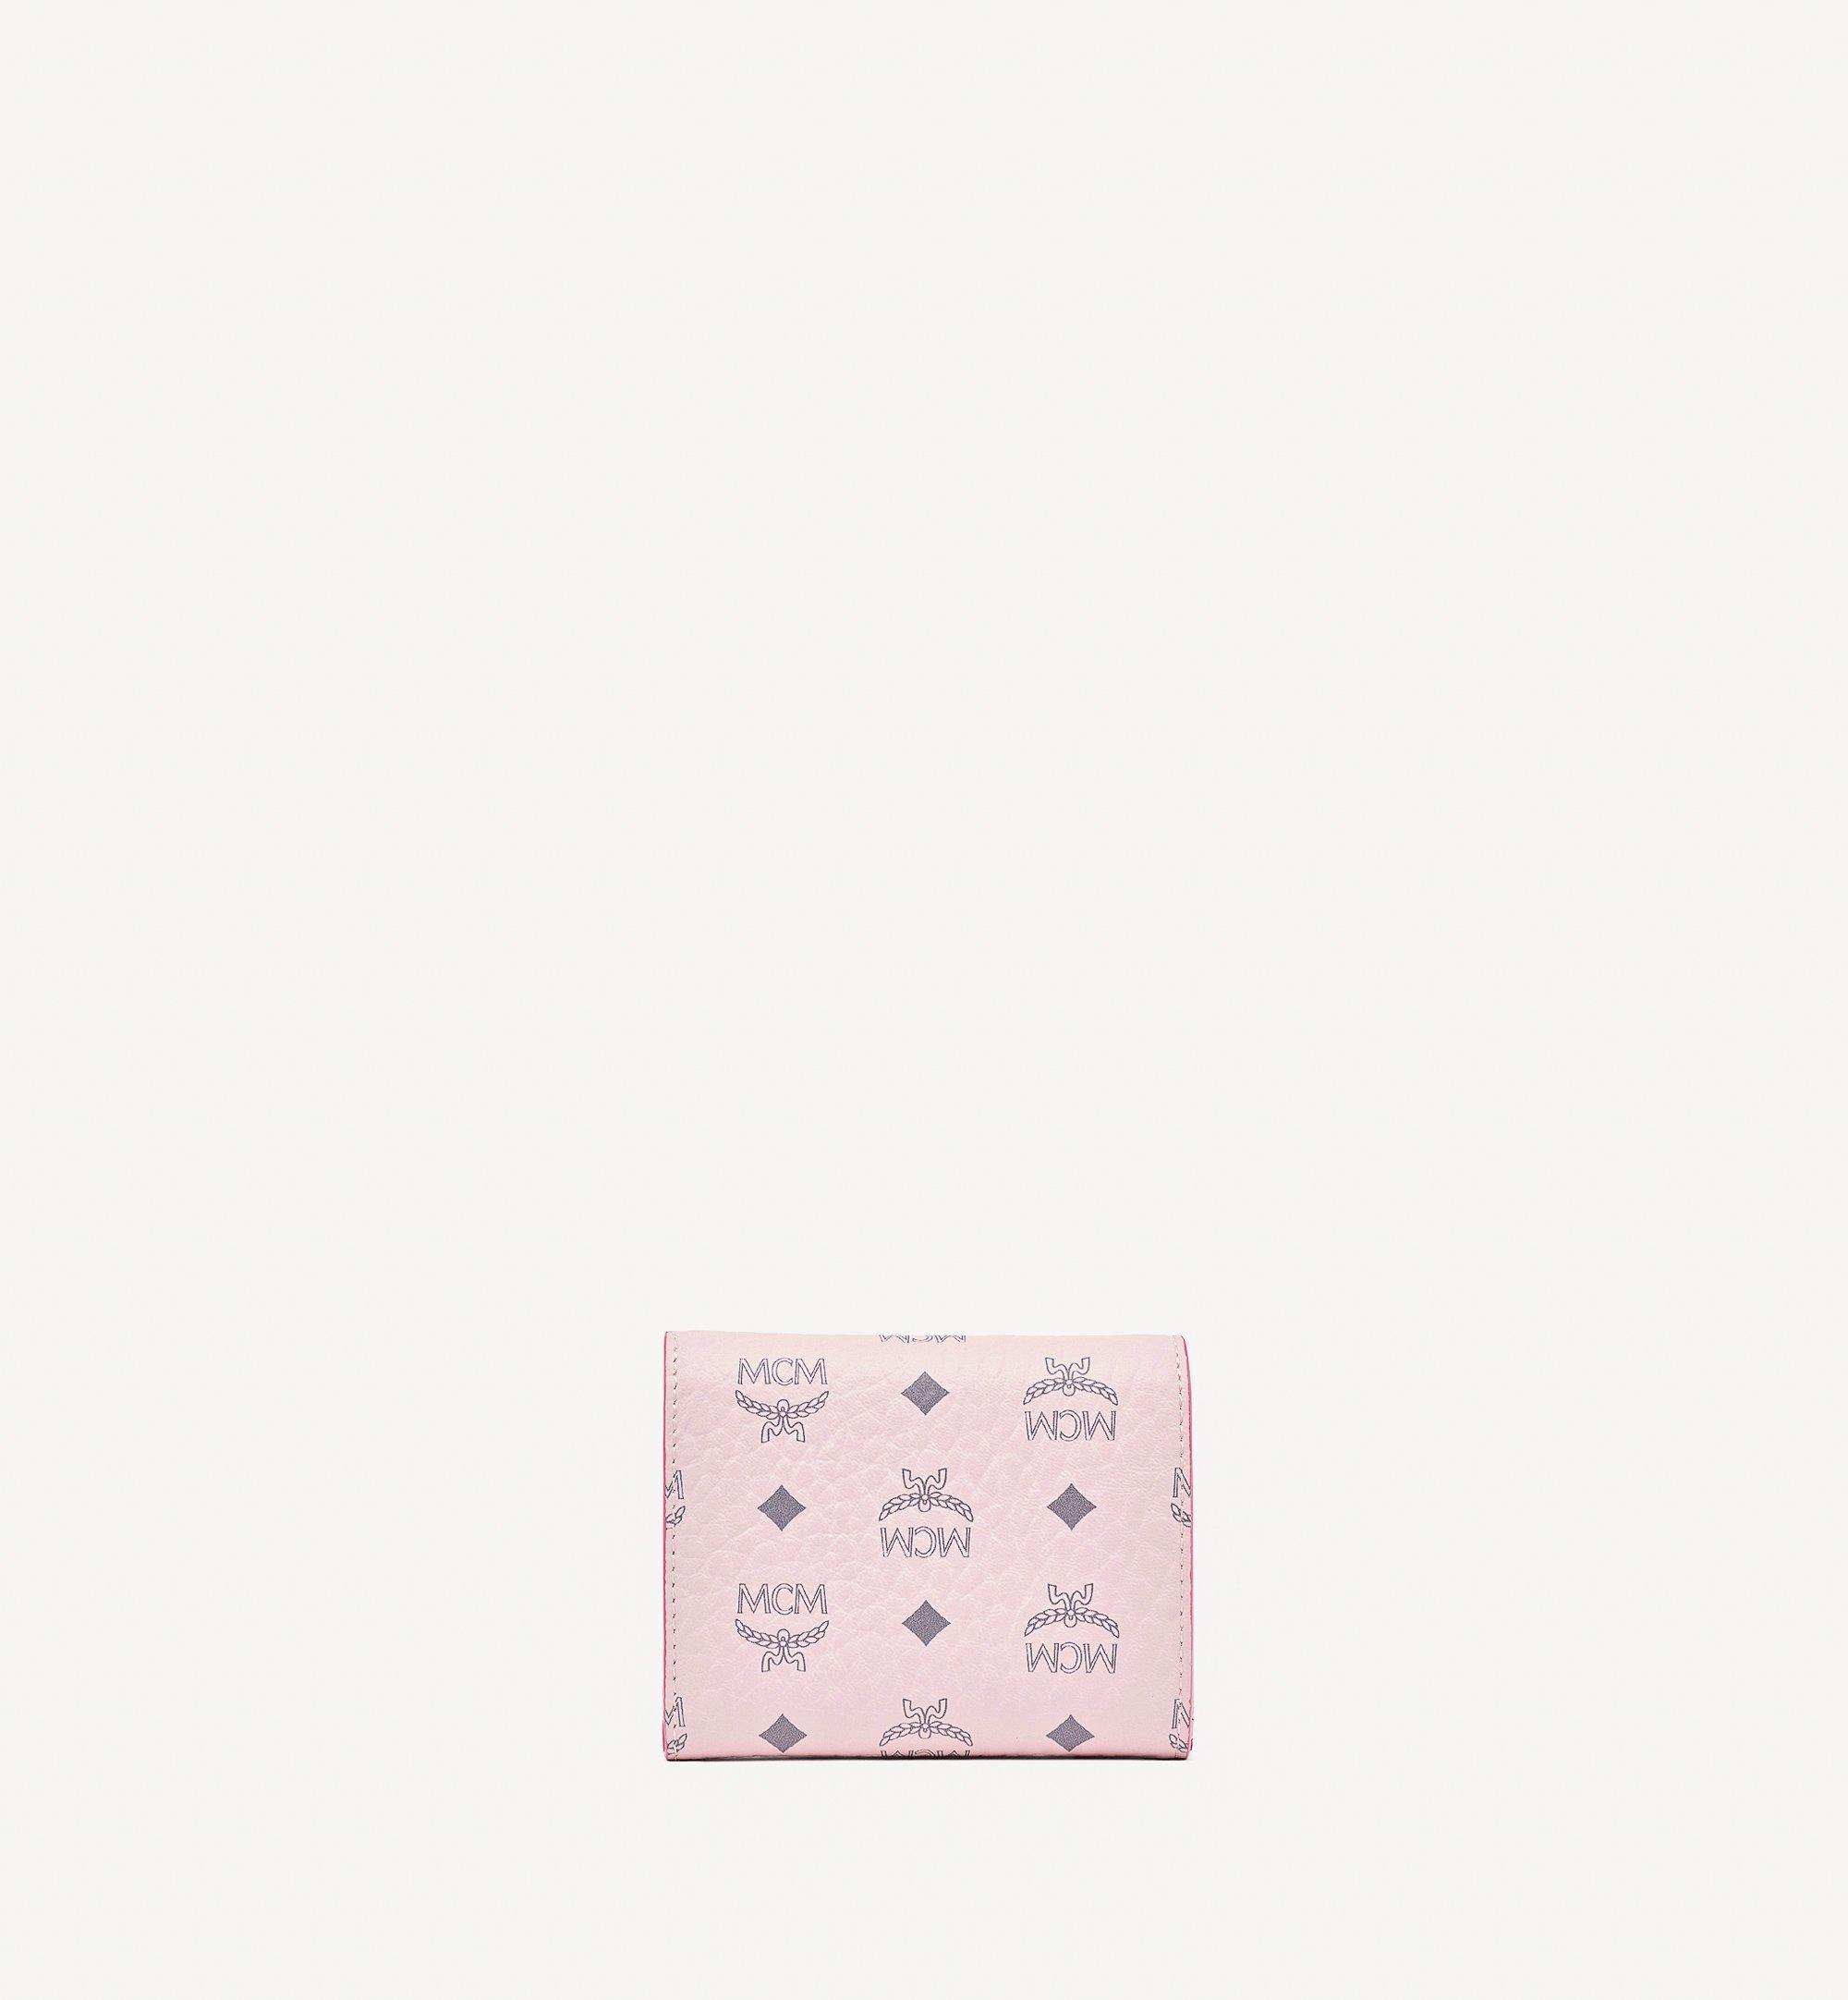 MCM Visetos Original 系列三折錢包 Pink MYSBSVI01QH001 更多視圖 2